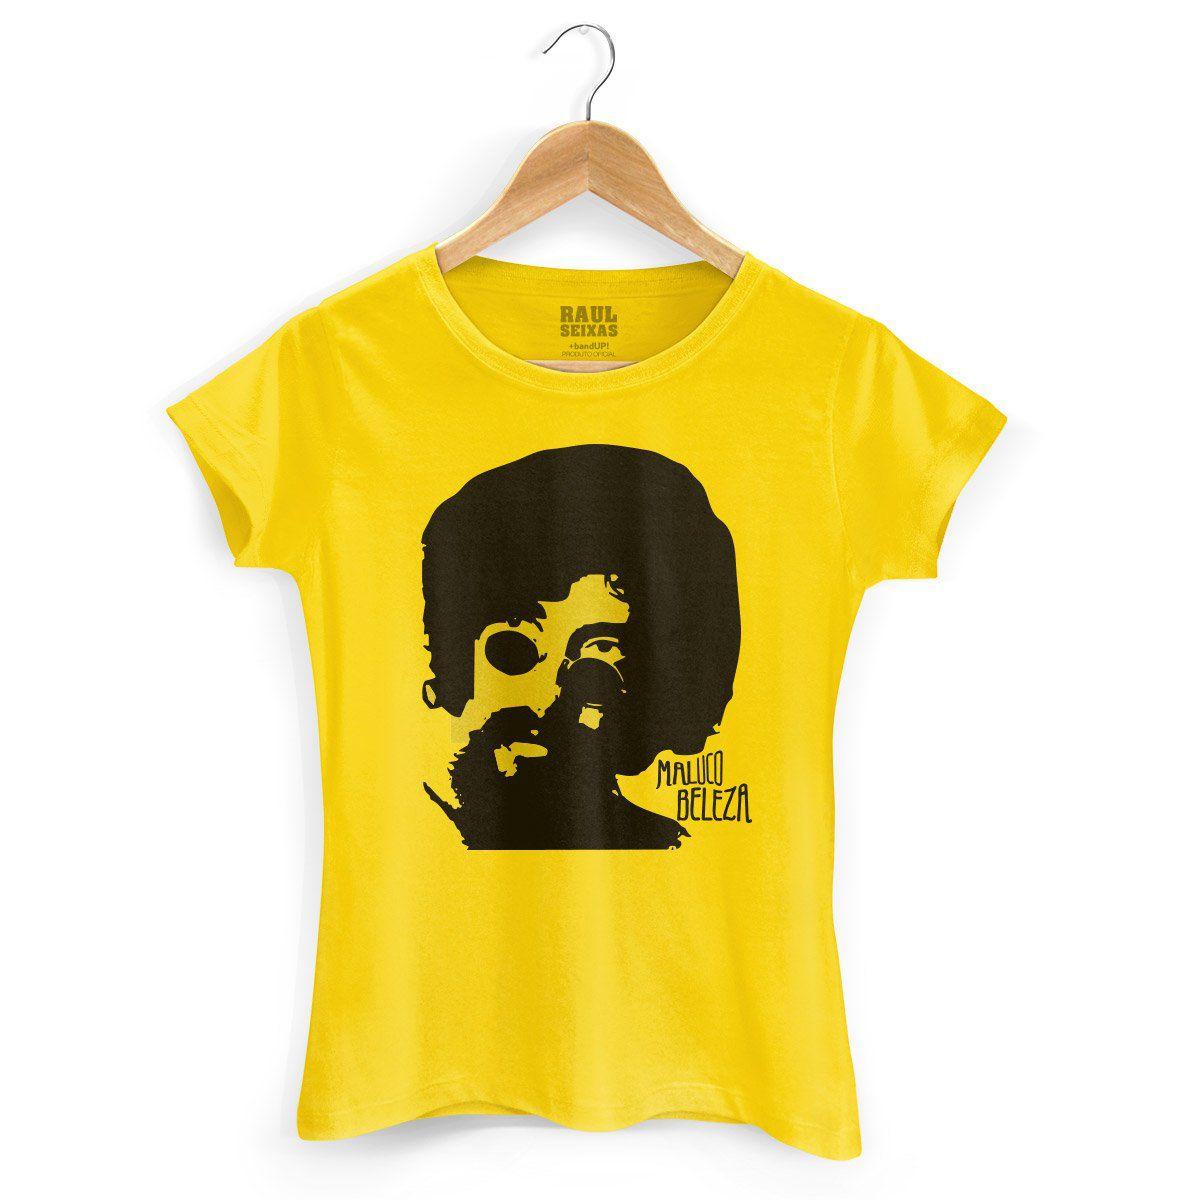 Camiseta Feminina Raul Seixas Maluco Beleza  - bandUP Store Marketplace